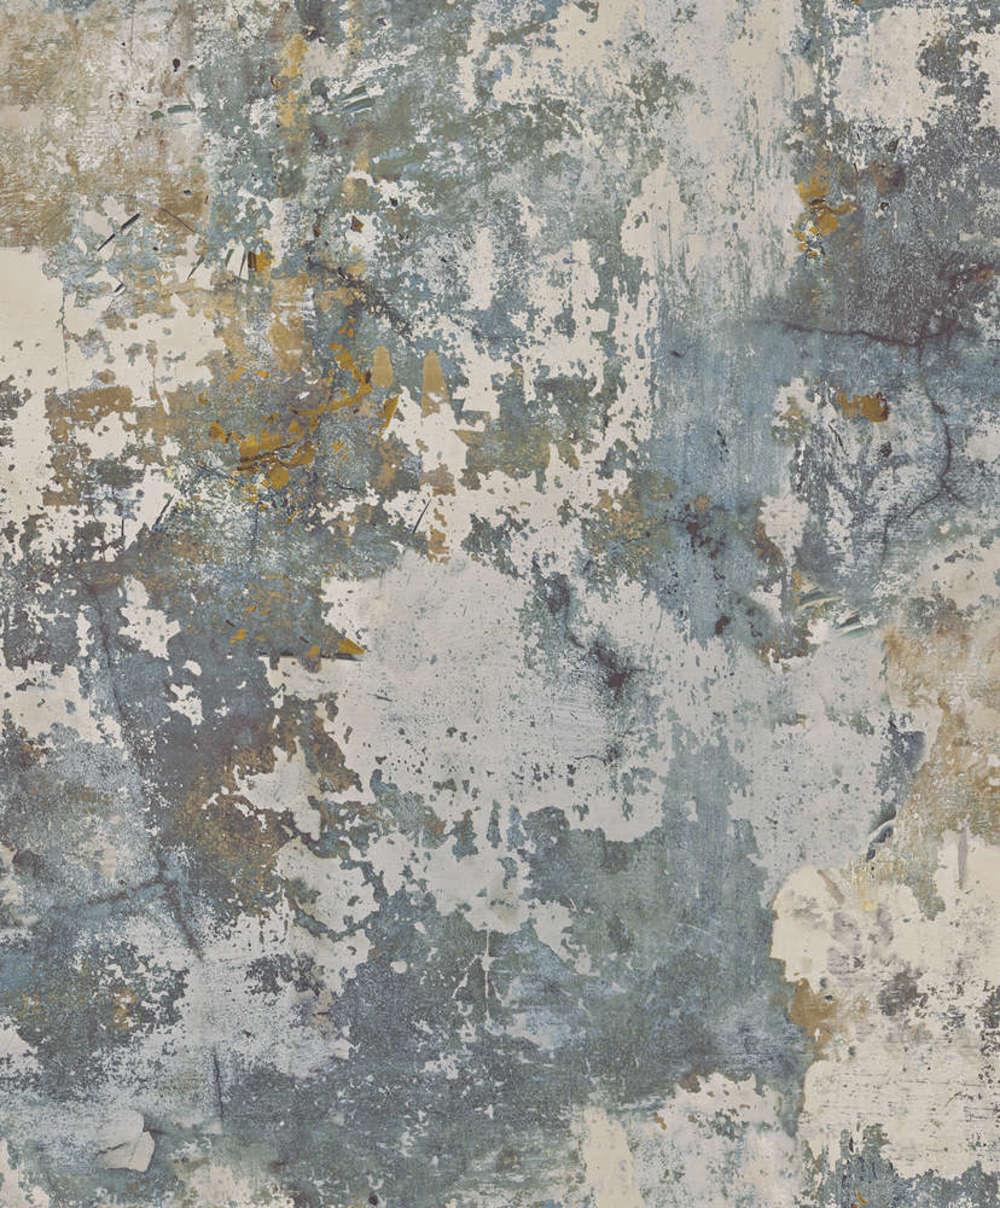 Dutch Wallcoverings Behang.Behang Dutch Wallcoverings Exposure Ep3001 Behangsite Com